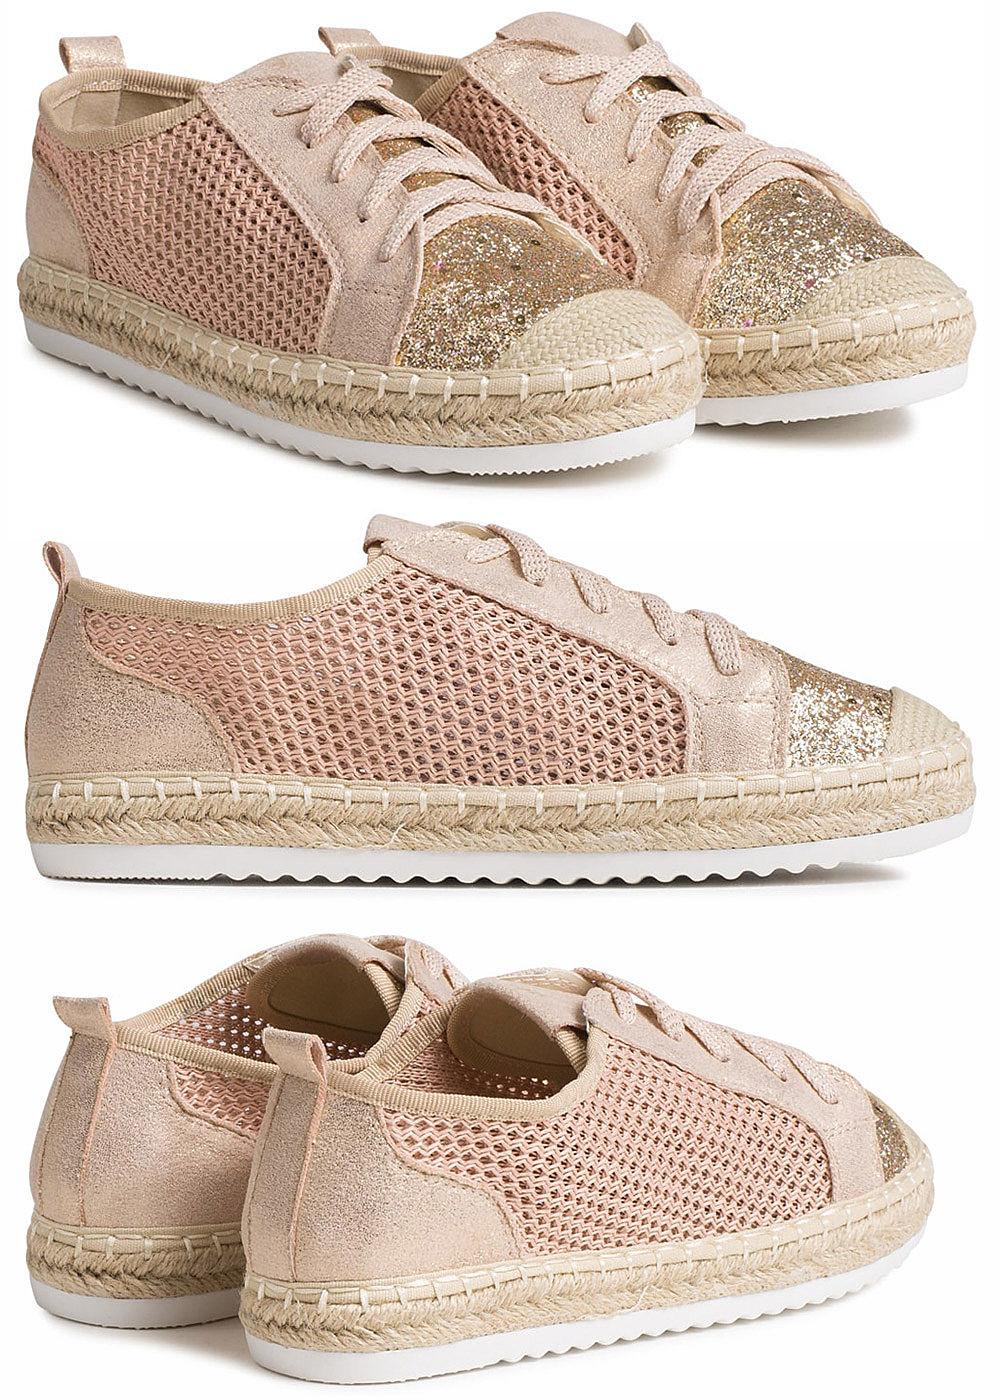 new concept 6dca3 3d061 Seventyseven Lifestyle Schuh Damen Sommer Sneaker Glitzer ...